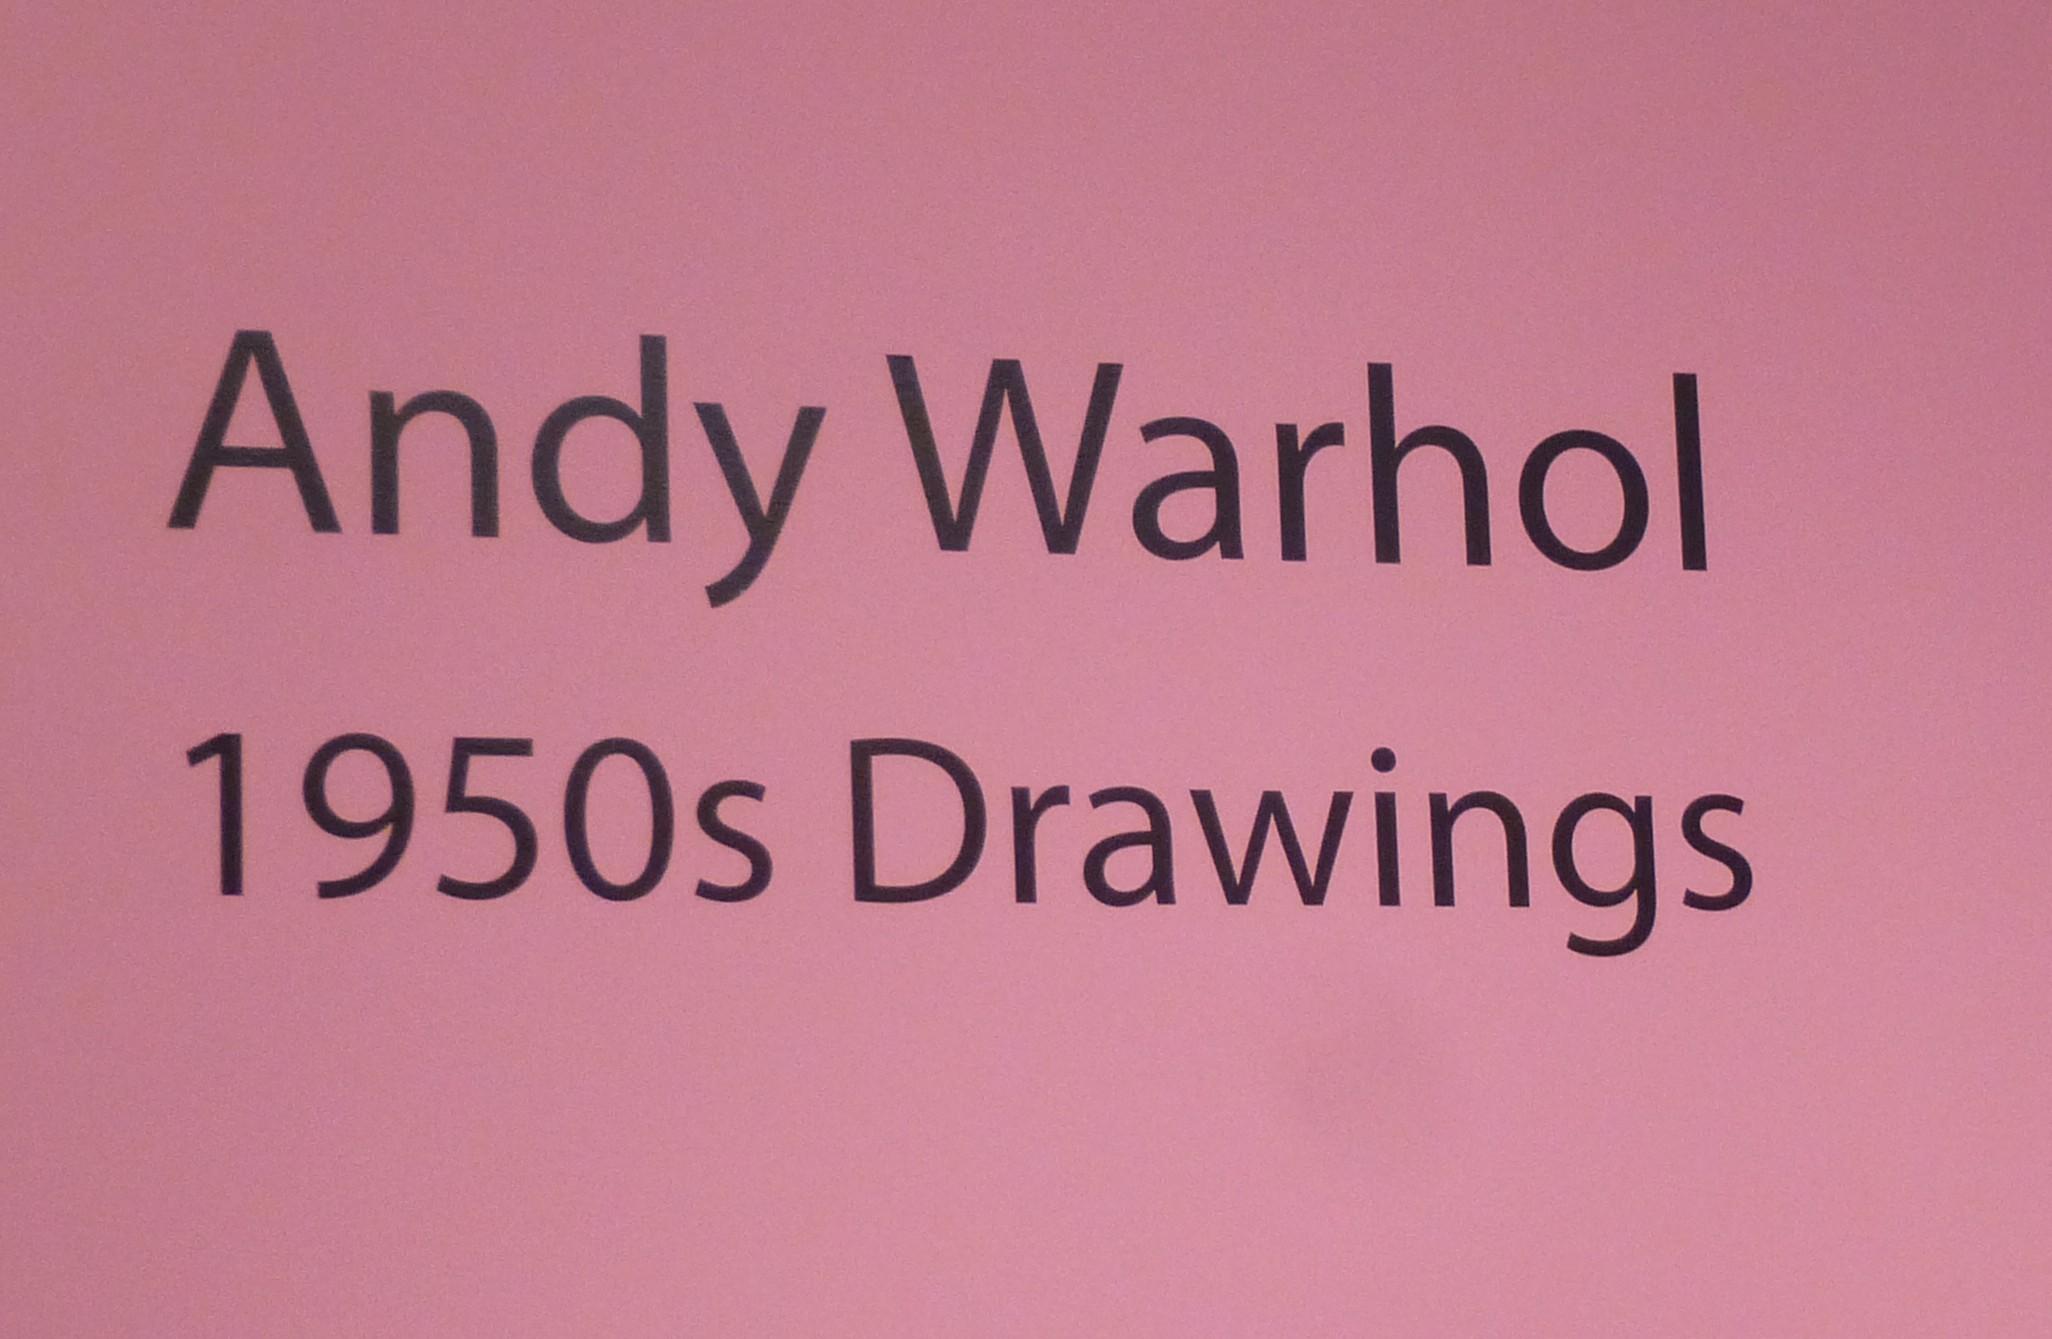 Andy Warhol 1950s Signage